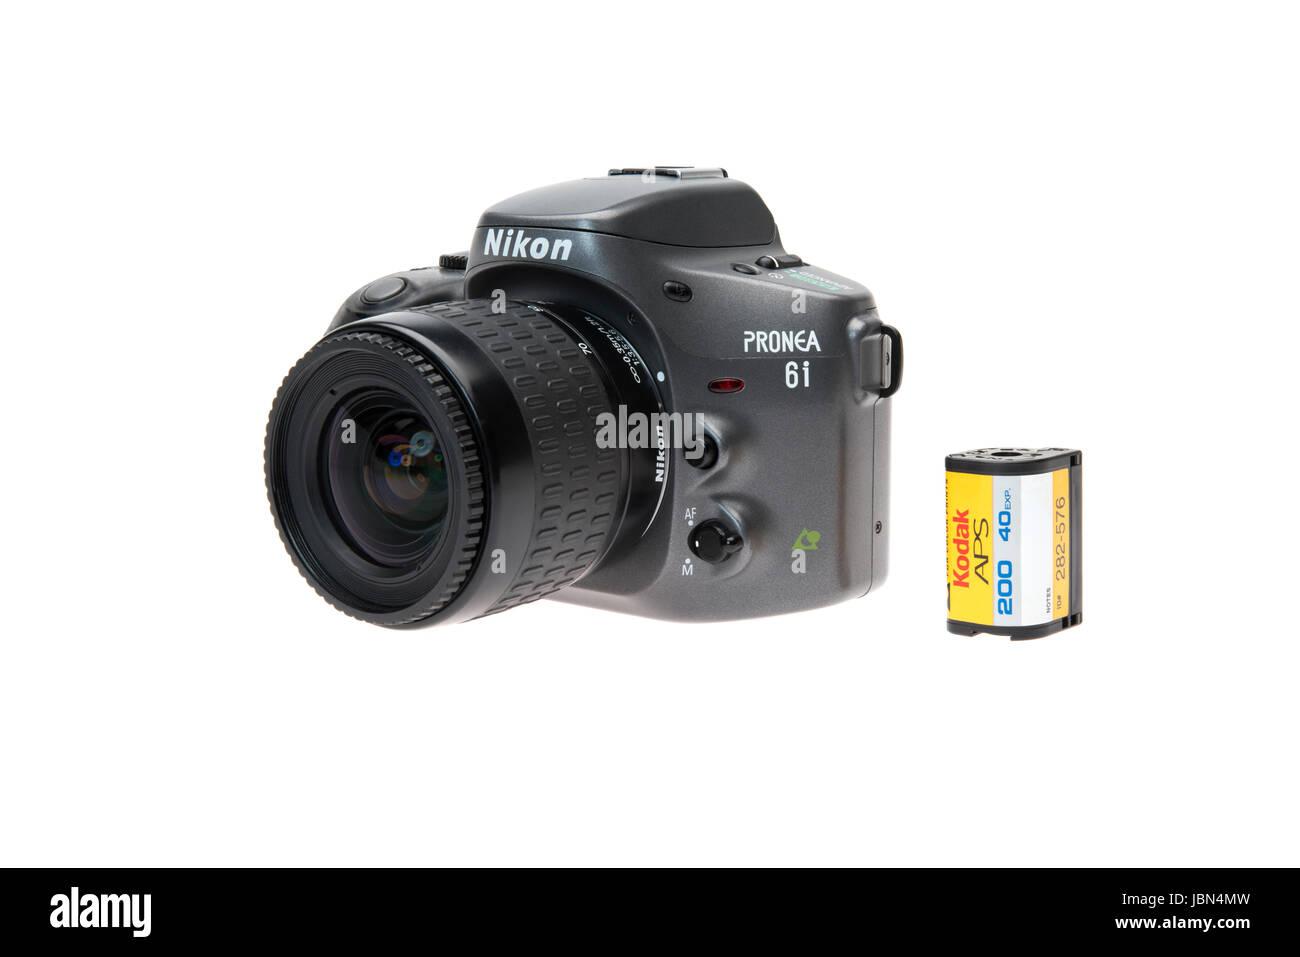 Nikon PRONEA 6i (600i) with IX-Nikkor lens APS film SLR camera released 1996 and Kodak Advantix APS film - Stock Image